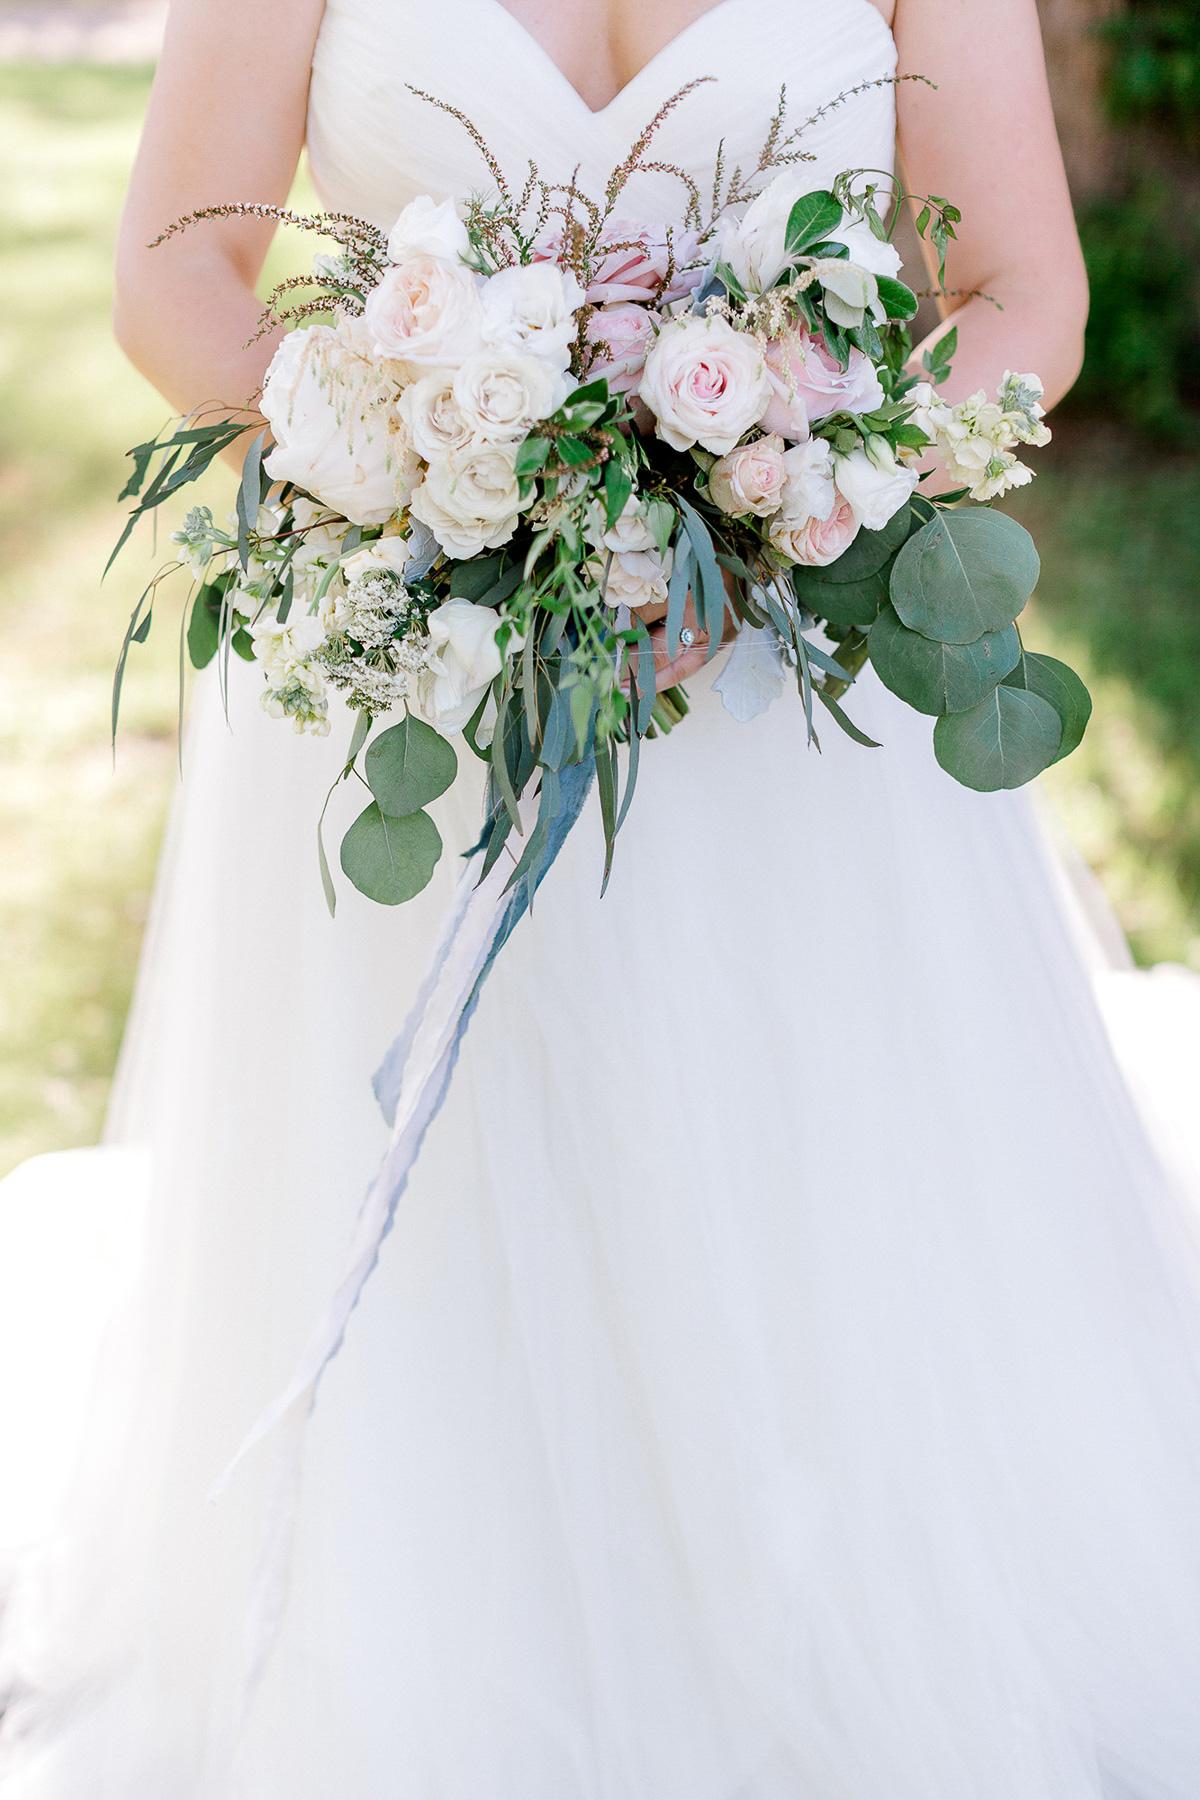 beatrice-elford-photography-vineyard-bride-swish-list-balls-falls-vineland-wedding-34.jpg